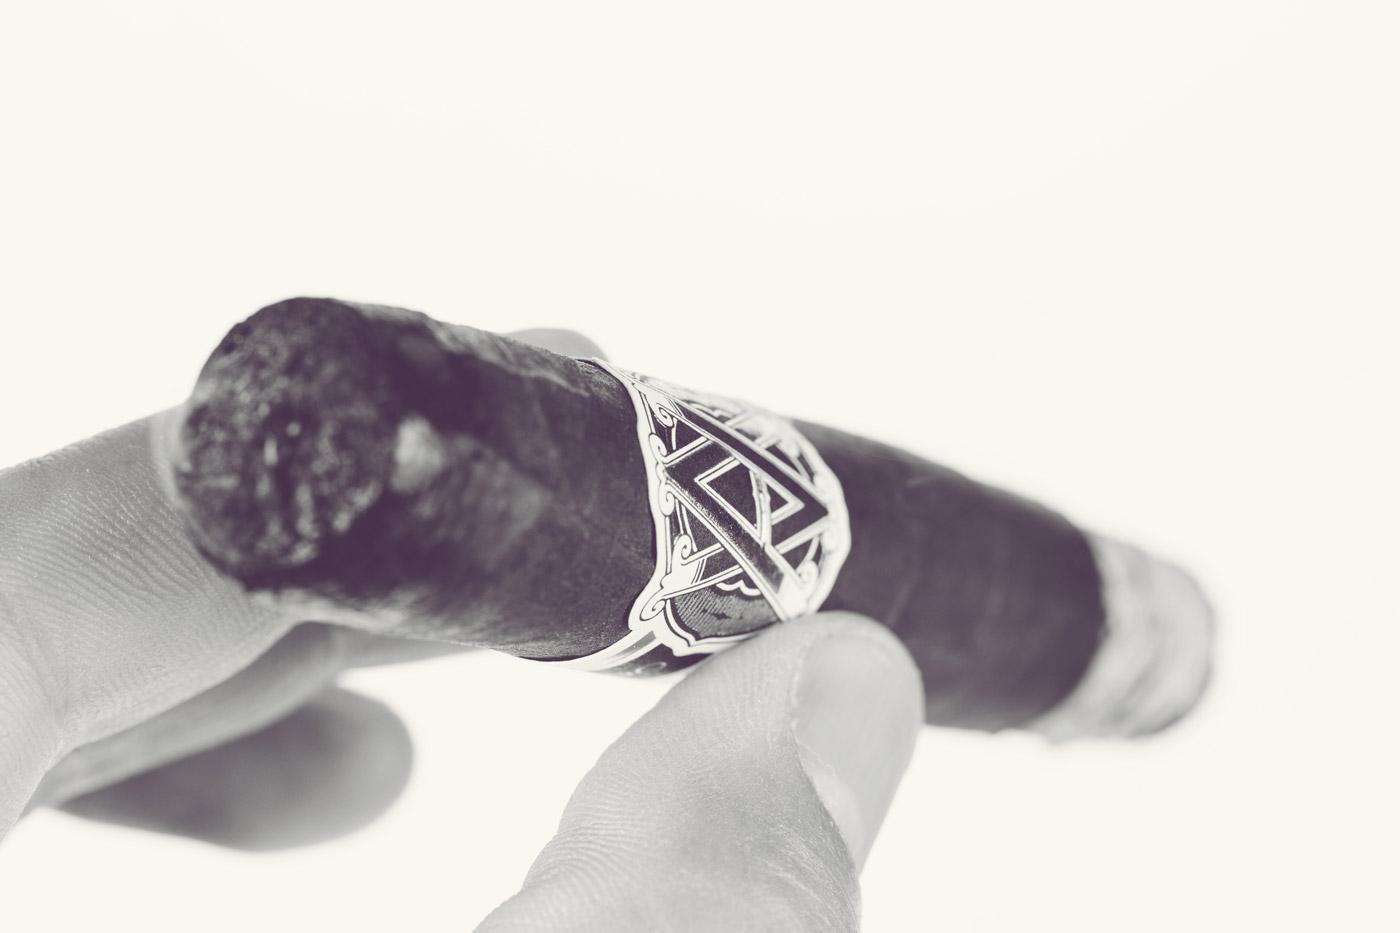 AVO Classic Maduro Robusto cigar review